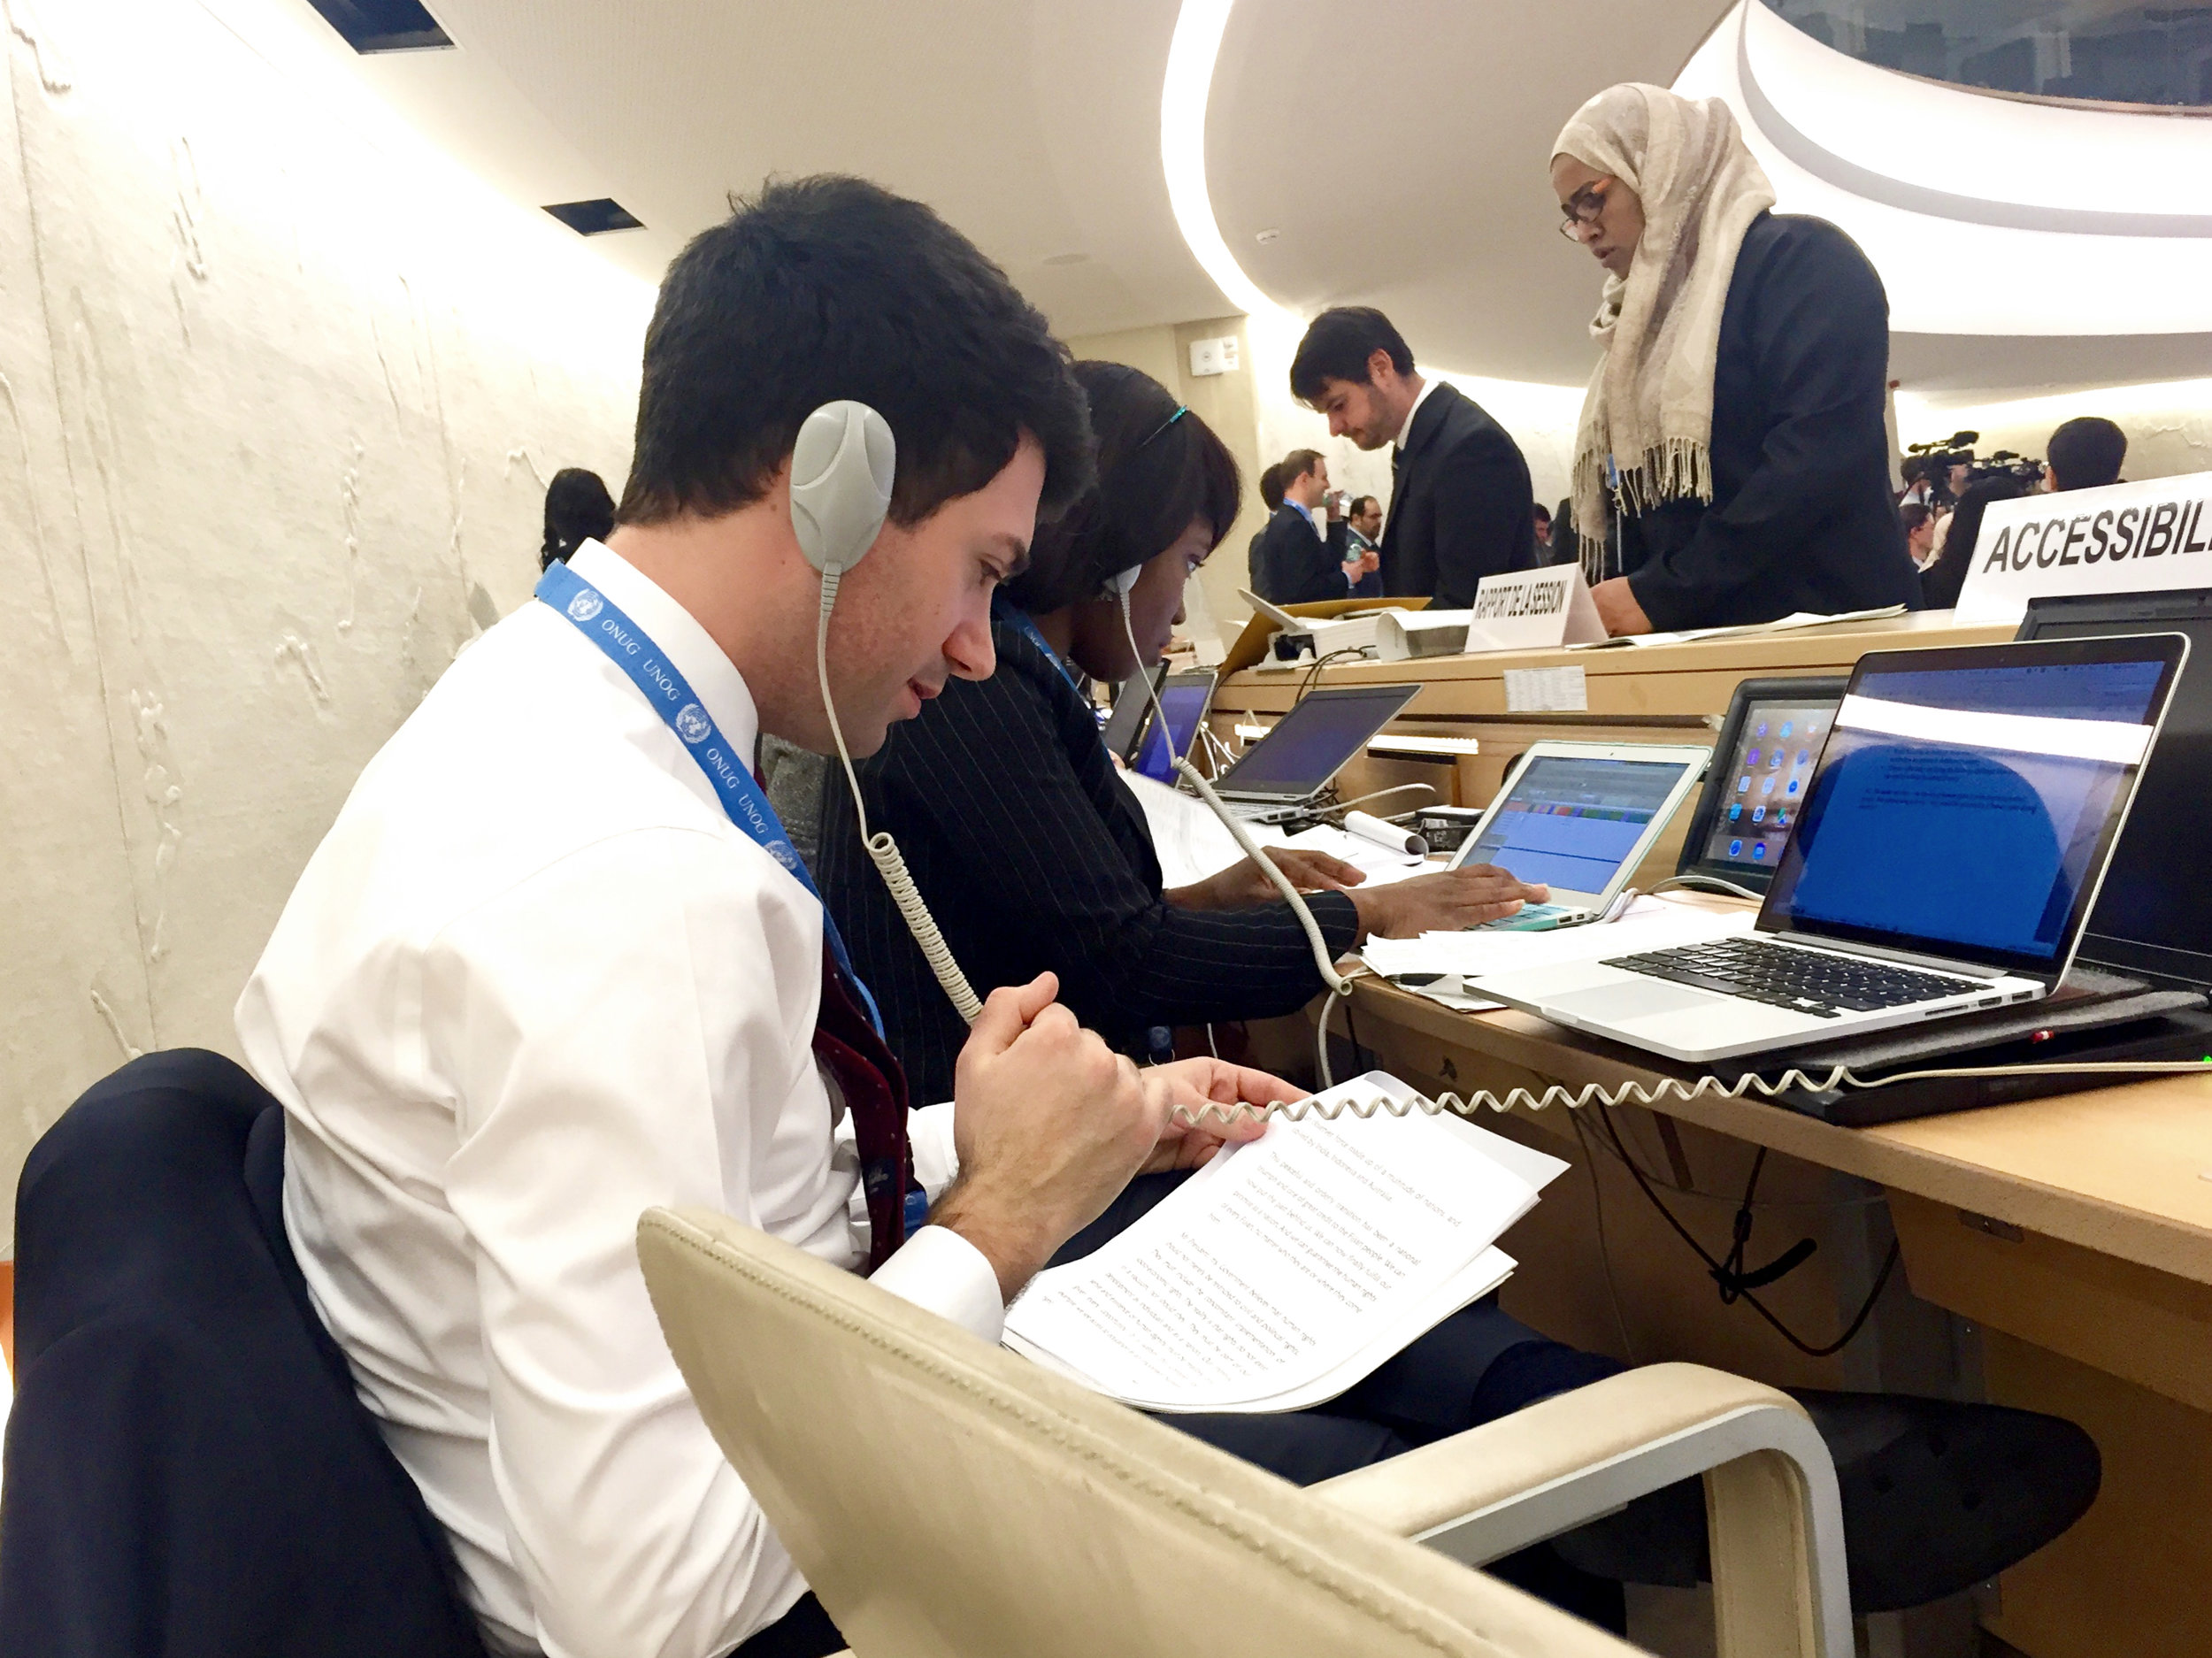 Nicholas interning at the UN.